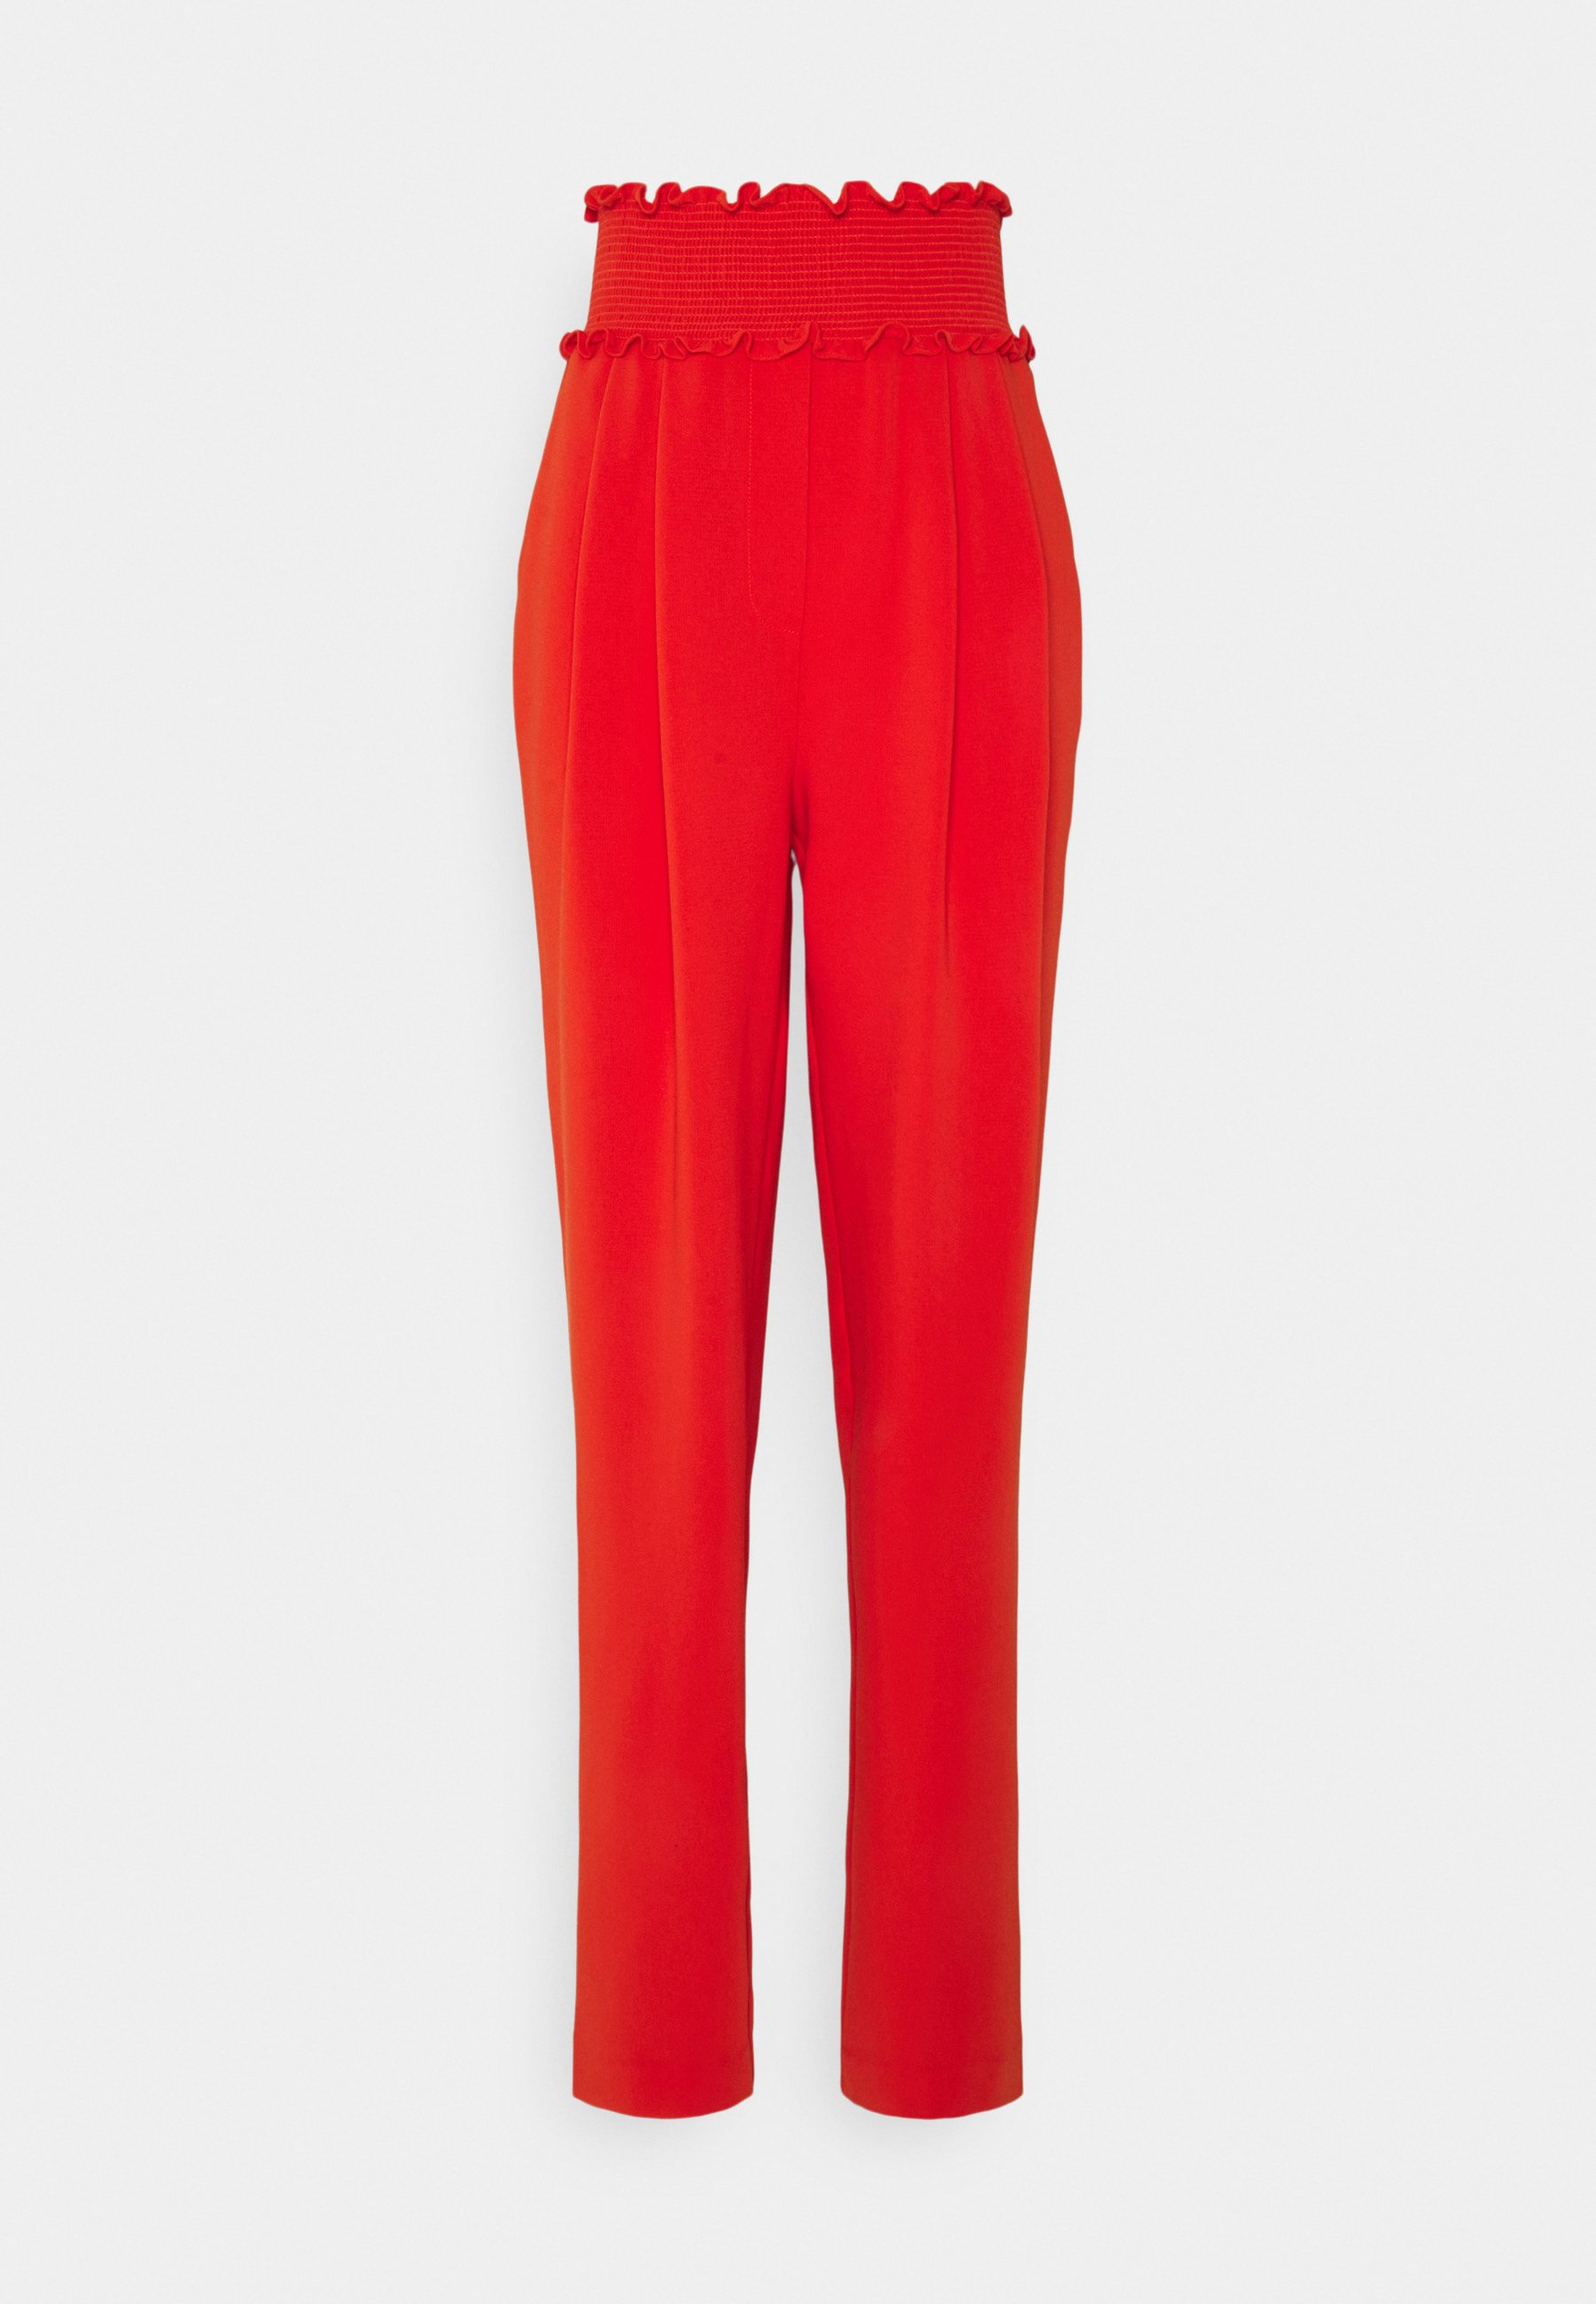 Femme SMOCKED JESSI PANT - Pantalon classique